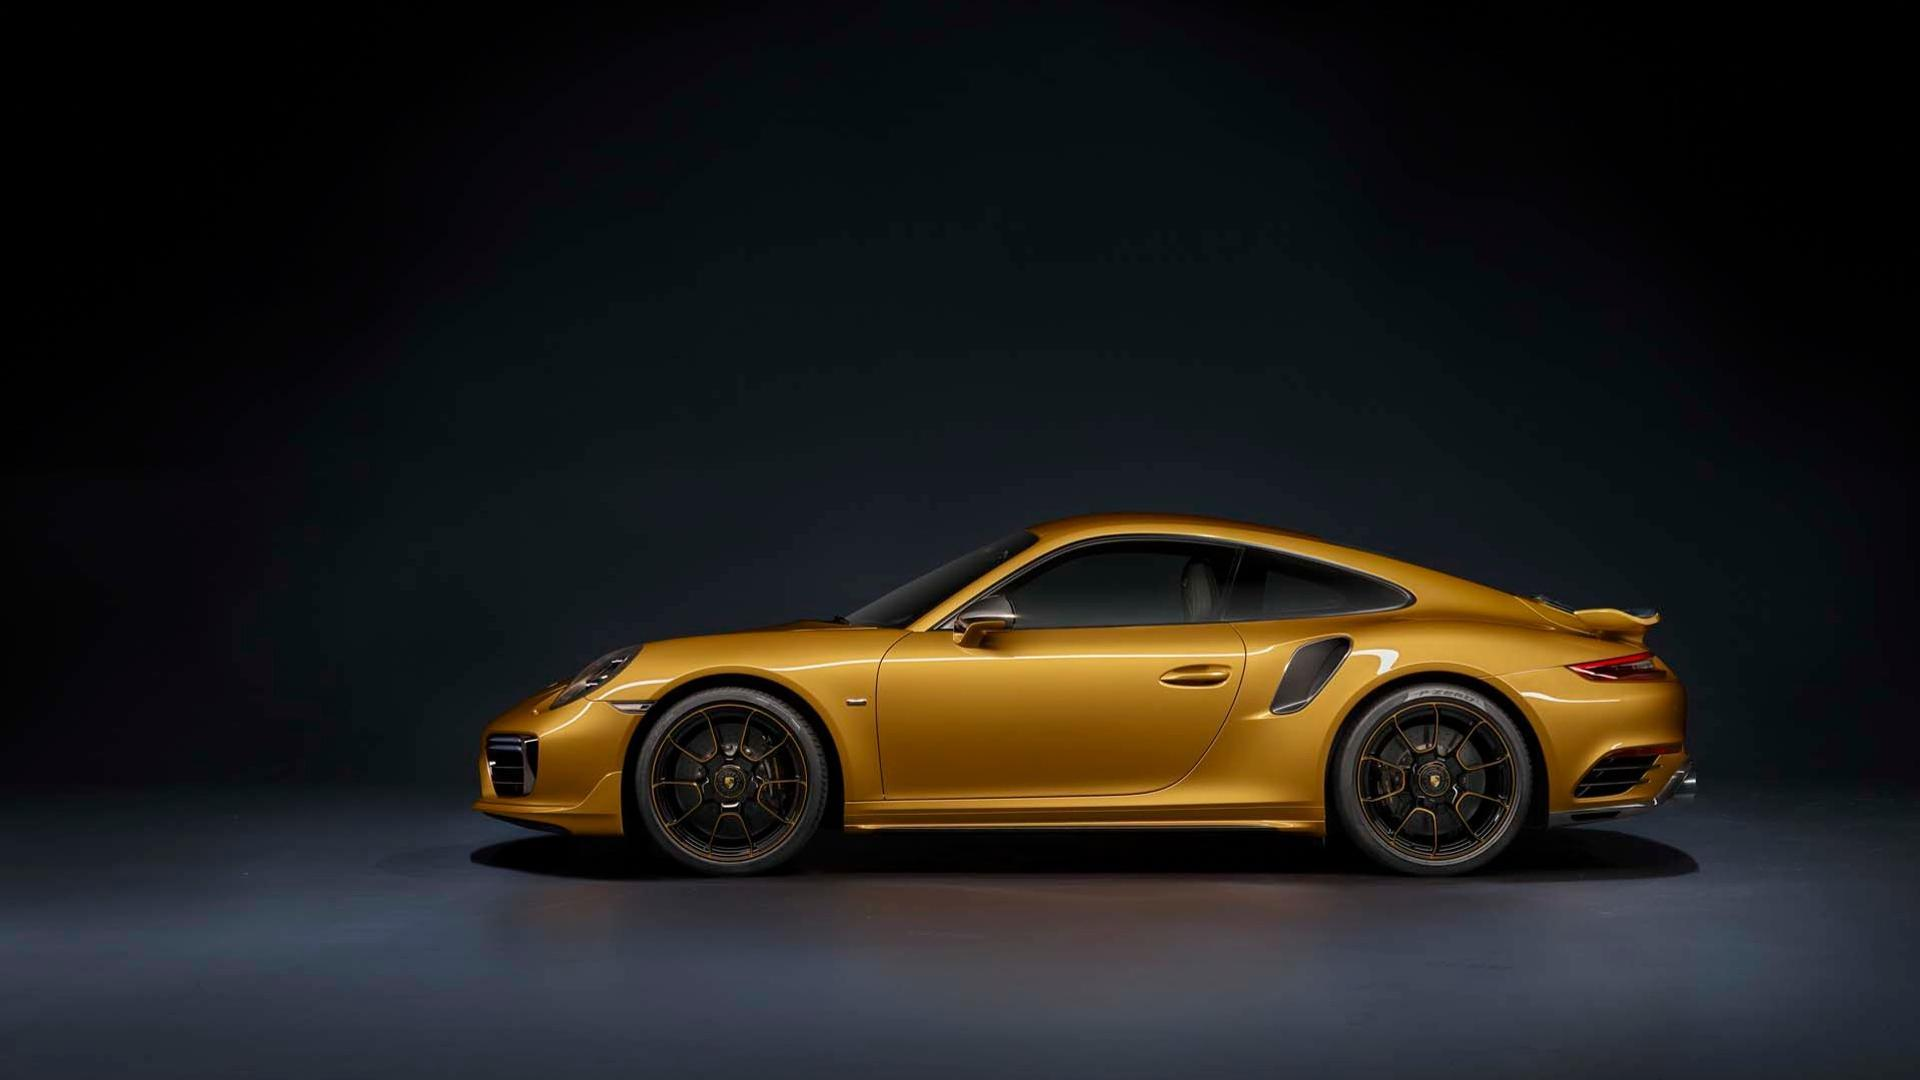 Porsche показала самую мощную версию 911 Turbo S 1